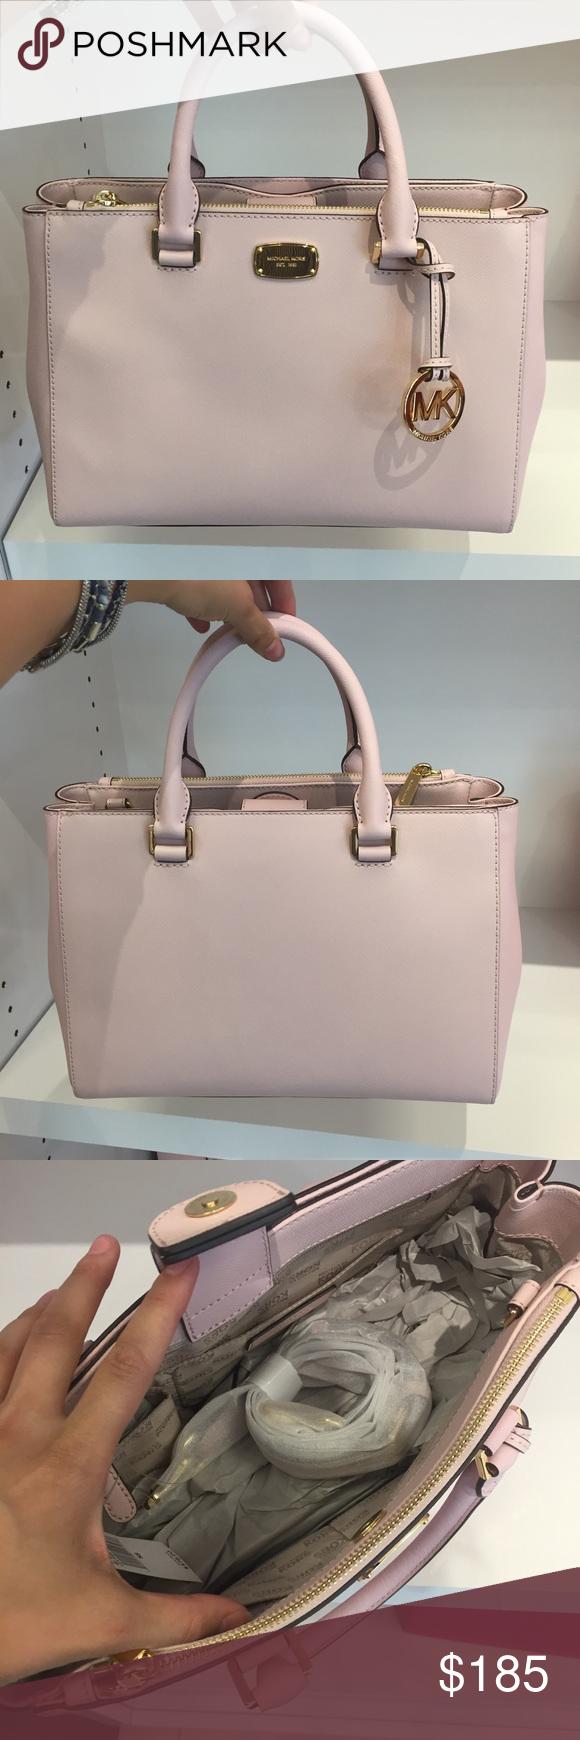 5e0188ced50d NWT🌸 MAKE OFFER 🌸 authentic MICHAEL KORS bag Brand new with tags. Authentic  Michael Kors purse. Long purse handles